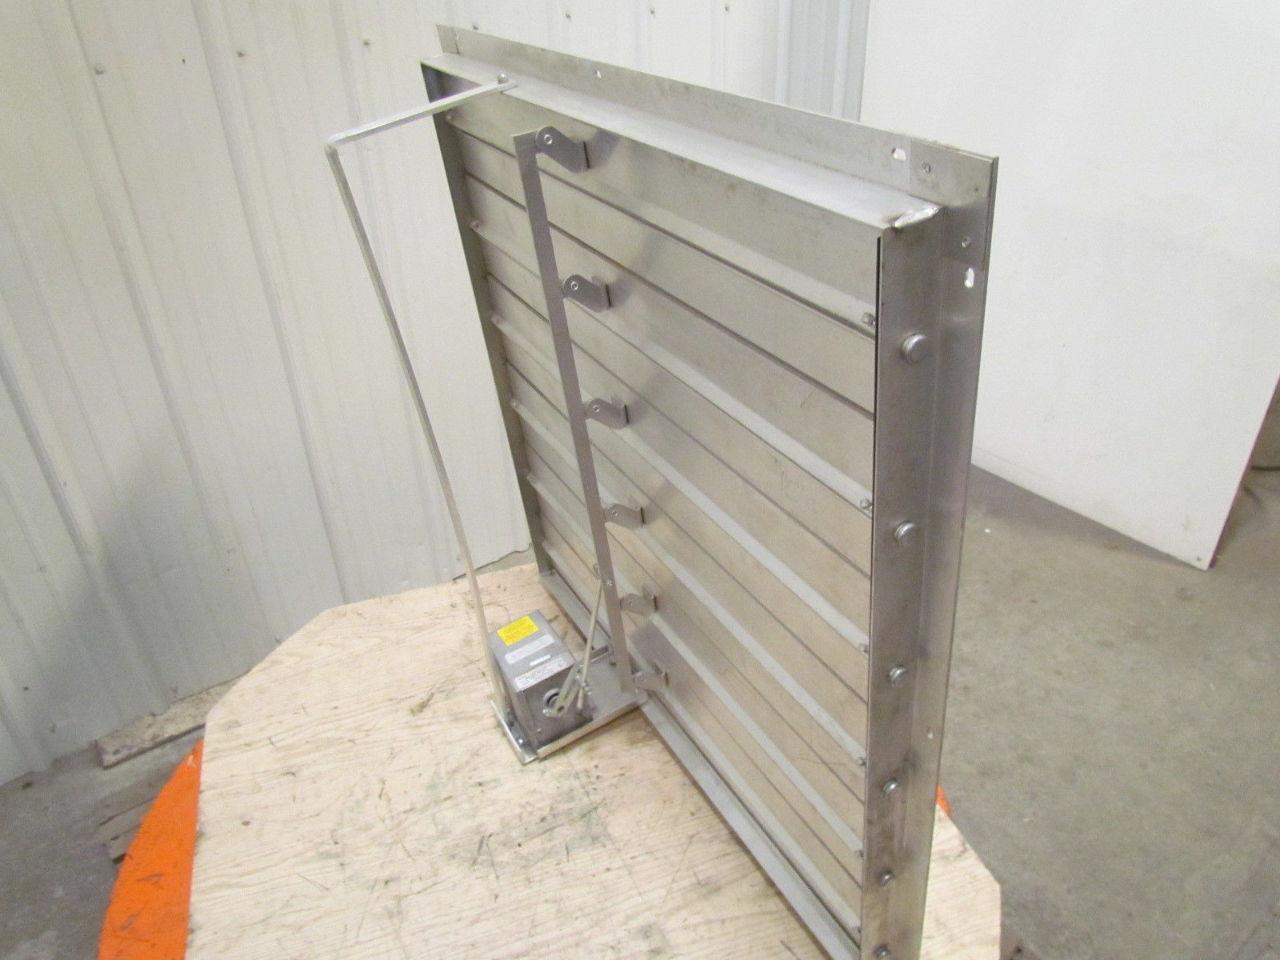 ma 407 701 0 4 36 x36 aluminum motorized damper 120 240v